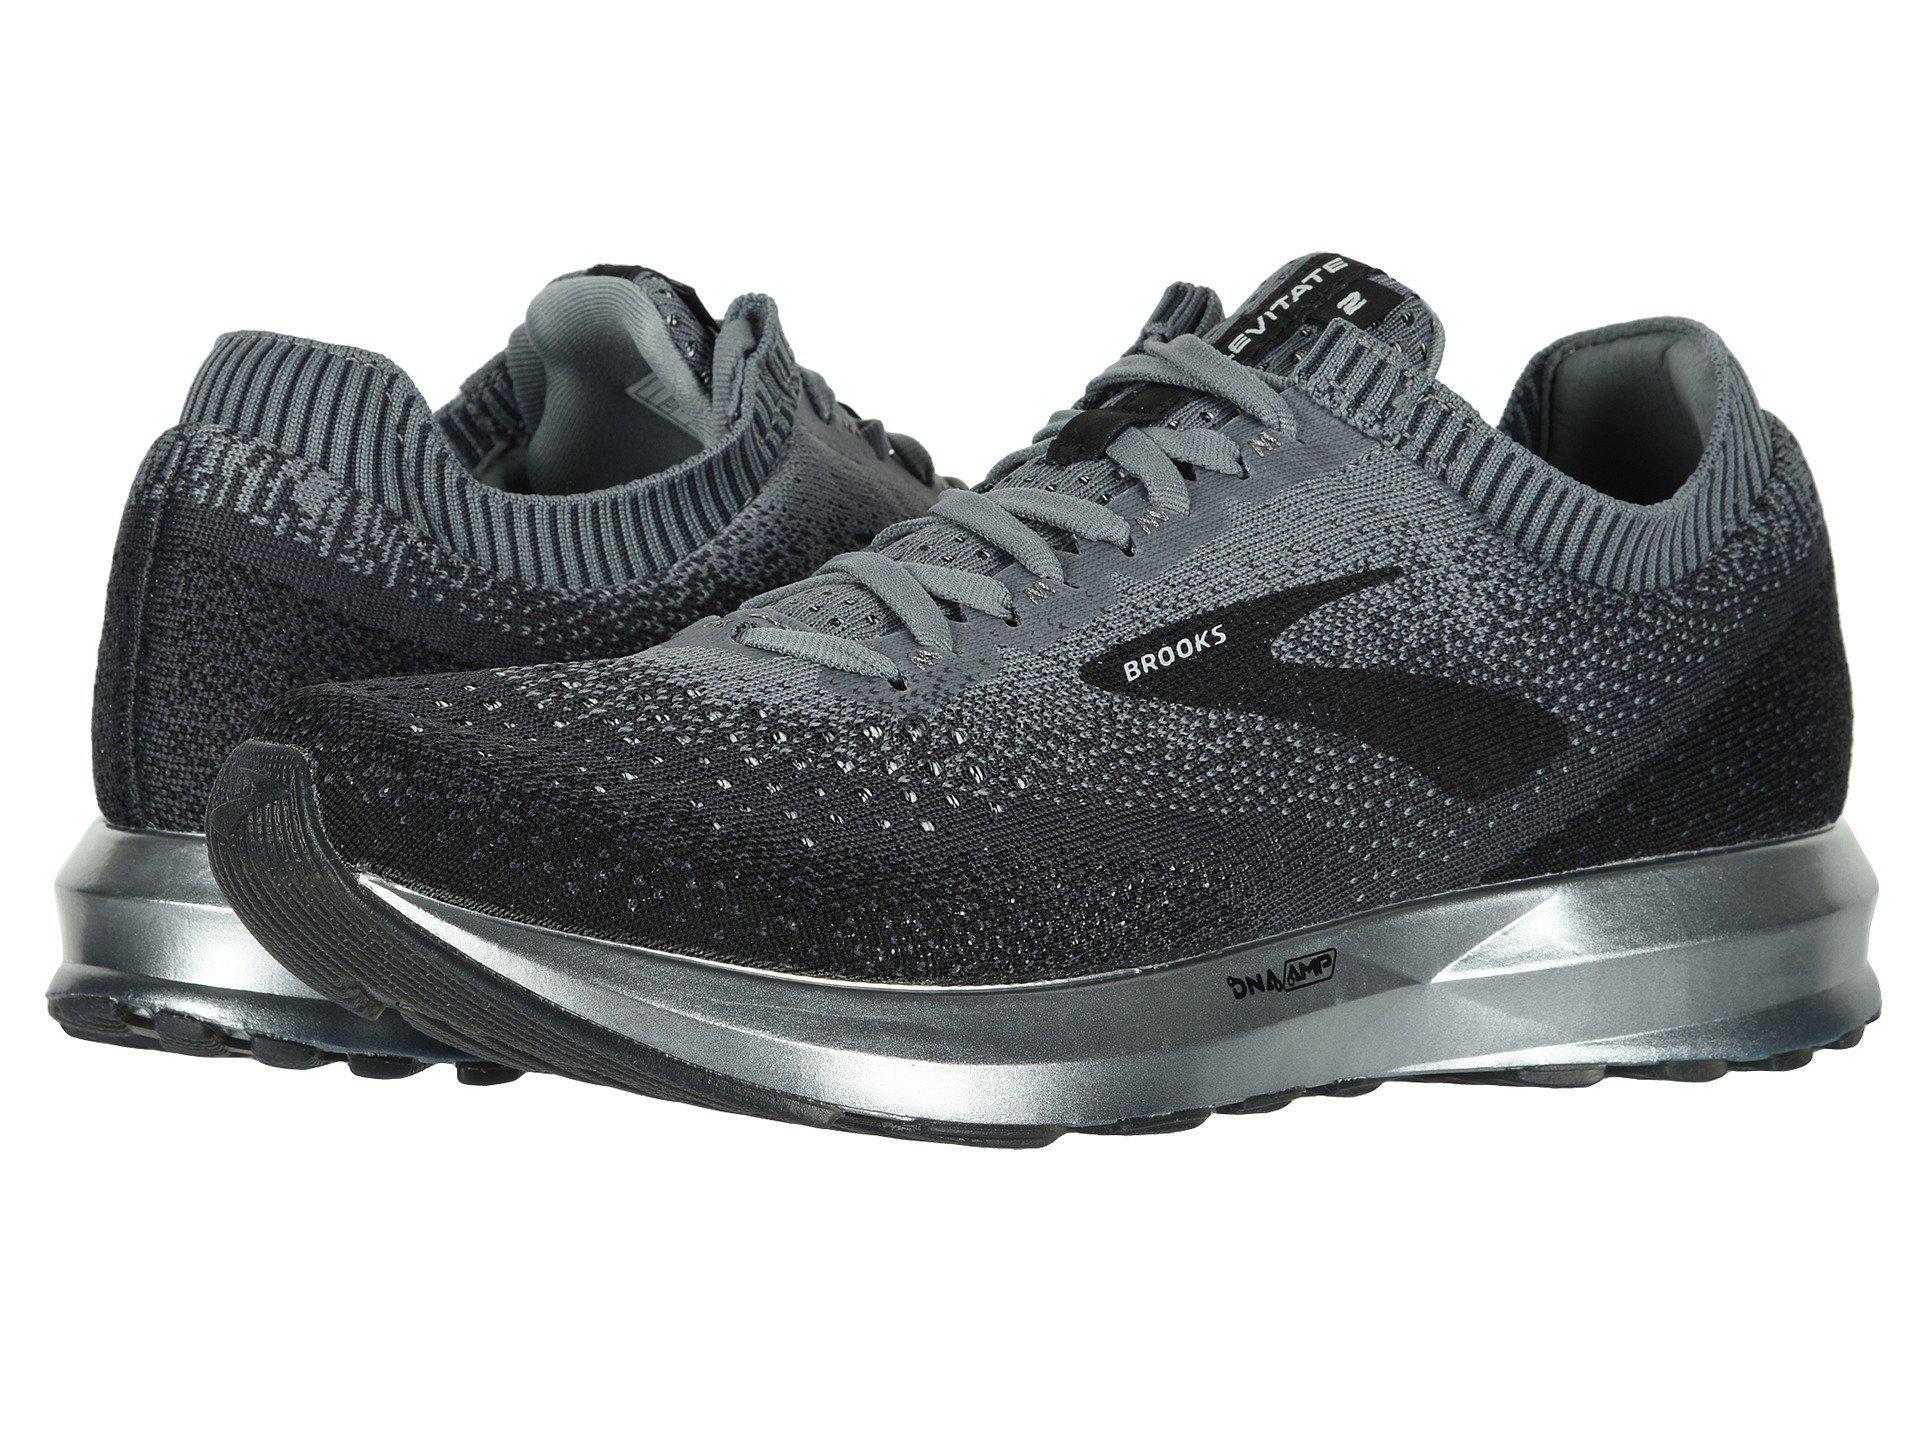 e61cffd1bf88d Brooks - Gray Levitate 2 (mallard Green grey black) Men s Running Shoes.  View fullscreen